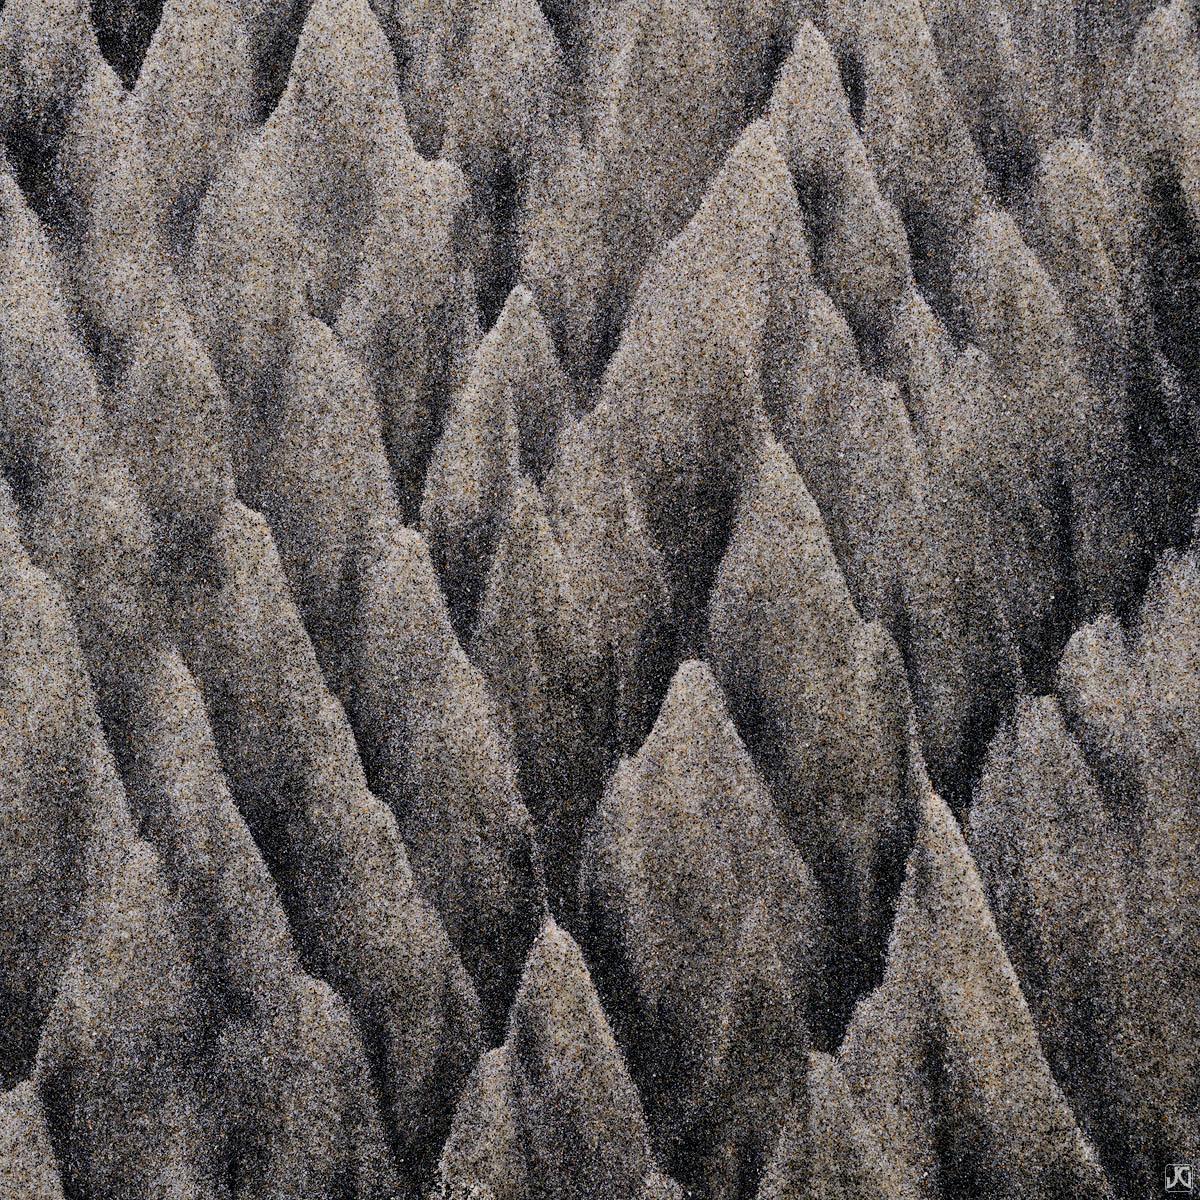 California, sand, beach, mountains, patterns, photo